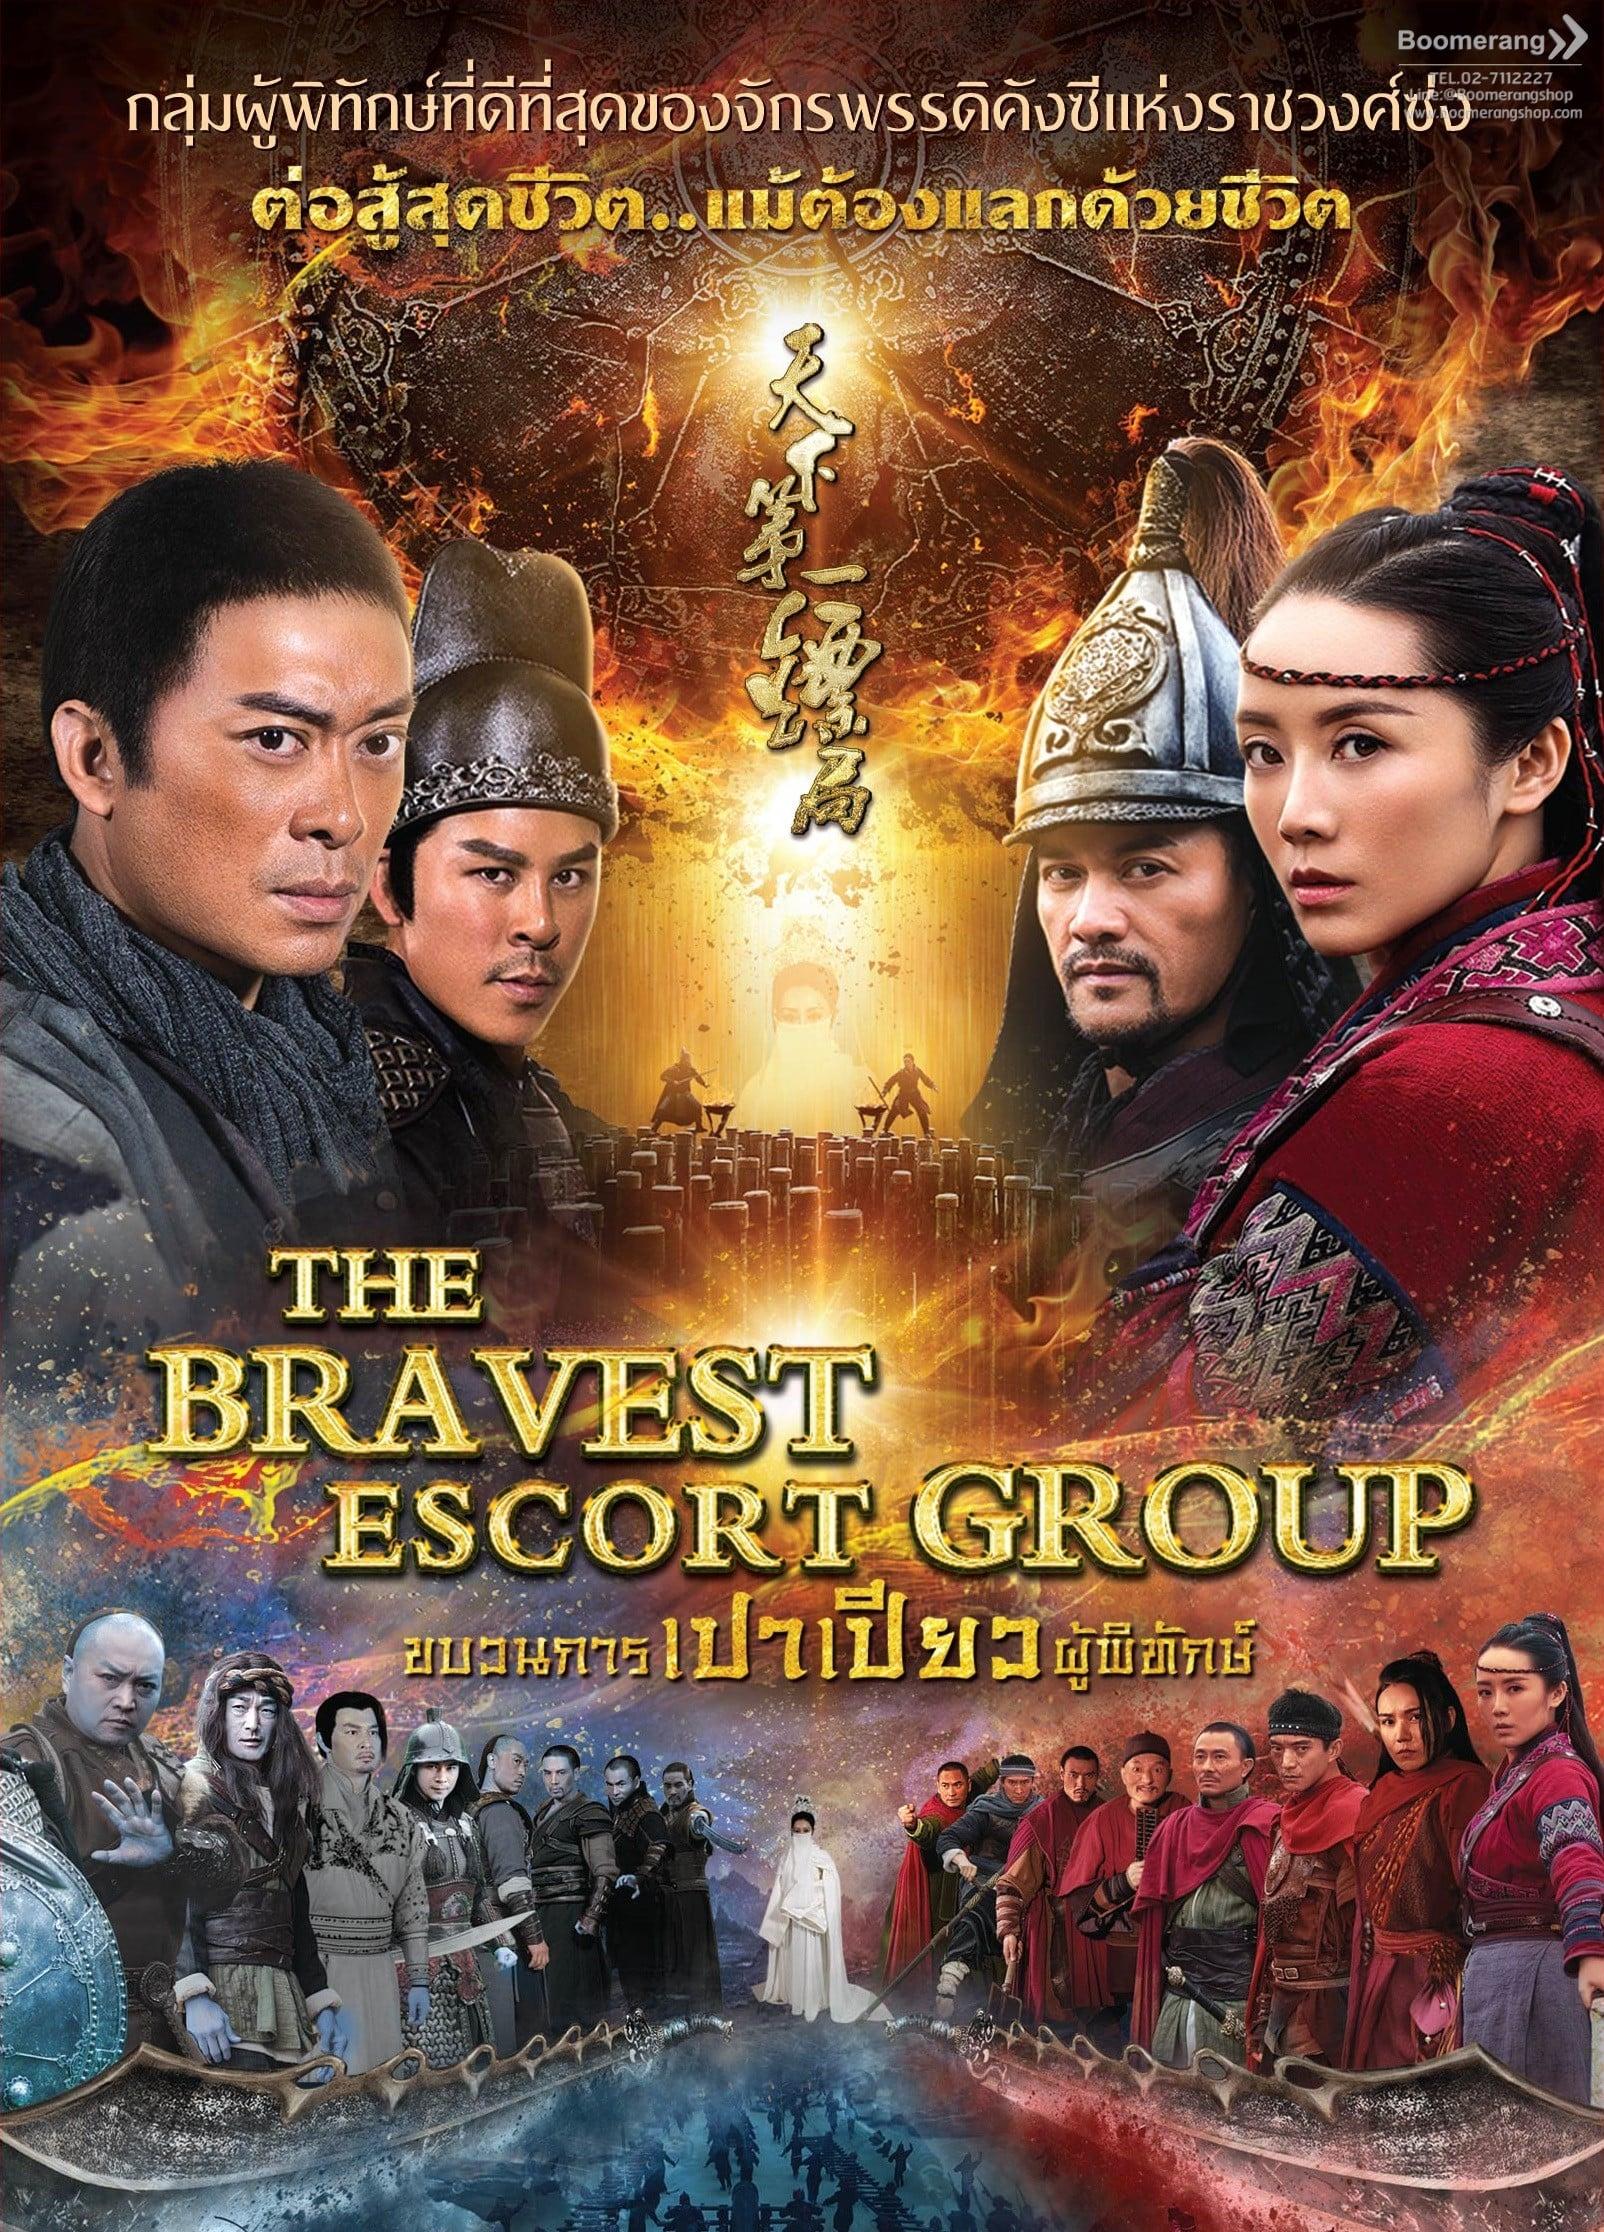 The Bravest Escort Group (2018)